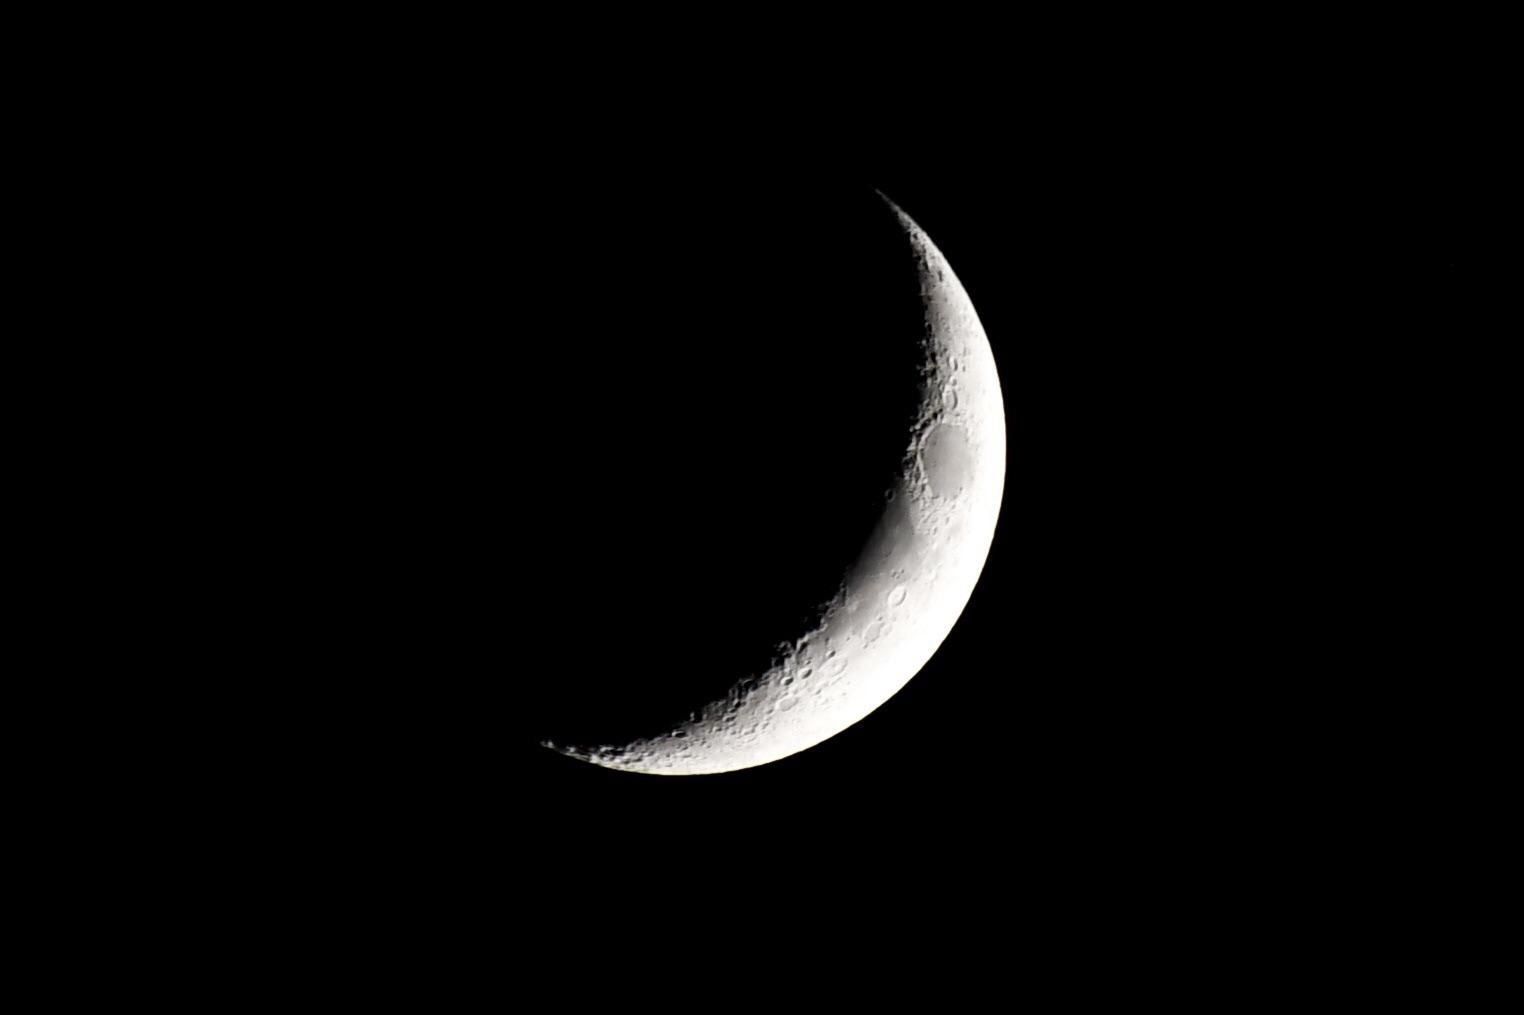 Waxing Crescent Moon Aug 14th 1524x1015 Oc Https Ift Tt 2mj3ju0 Crescent Moon Art Cresent Moon Tattoo Moon